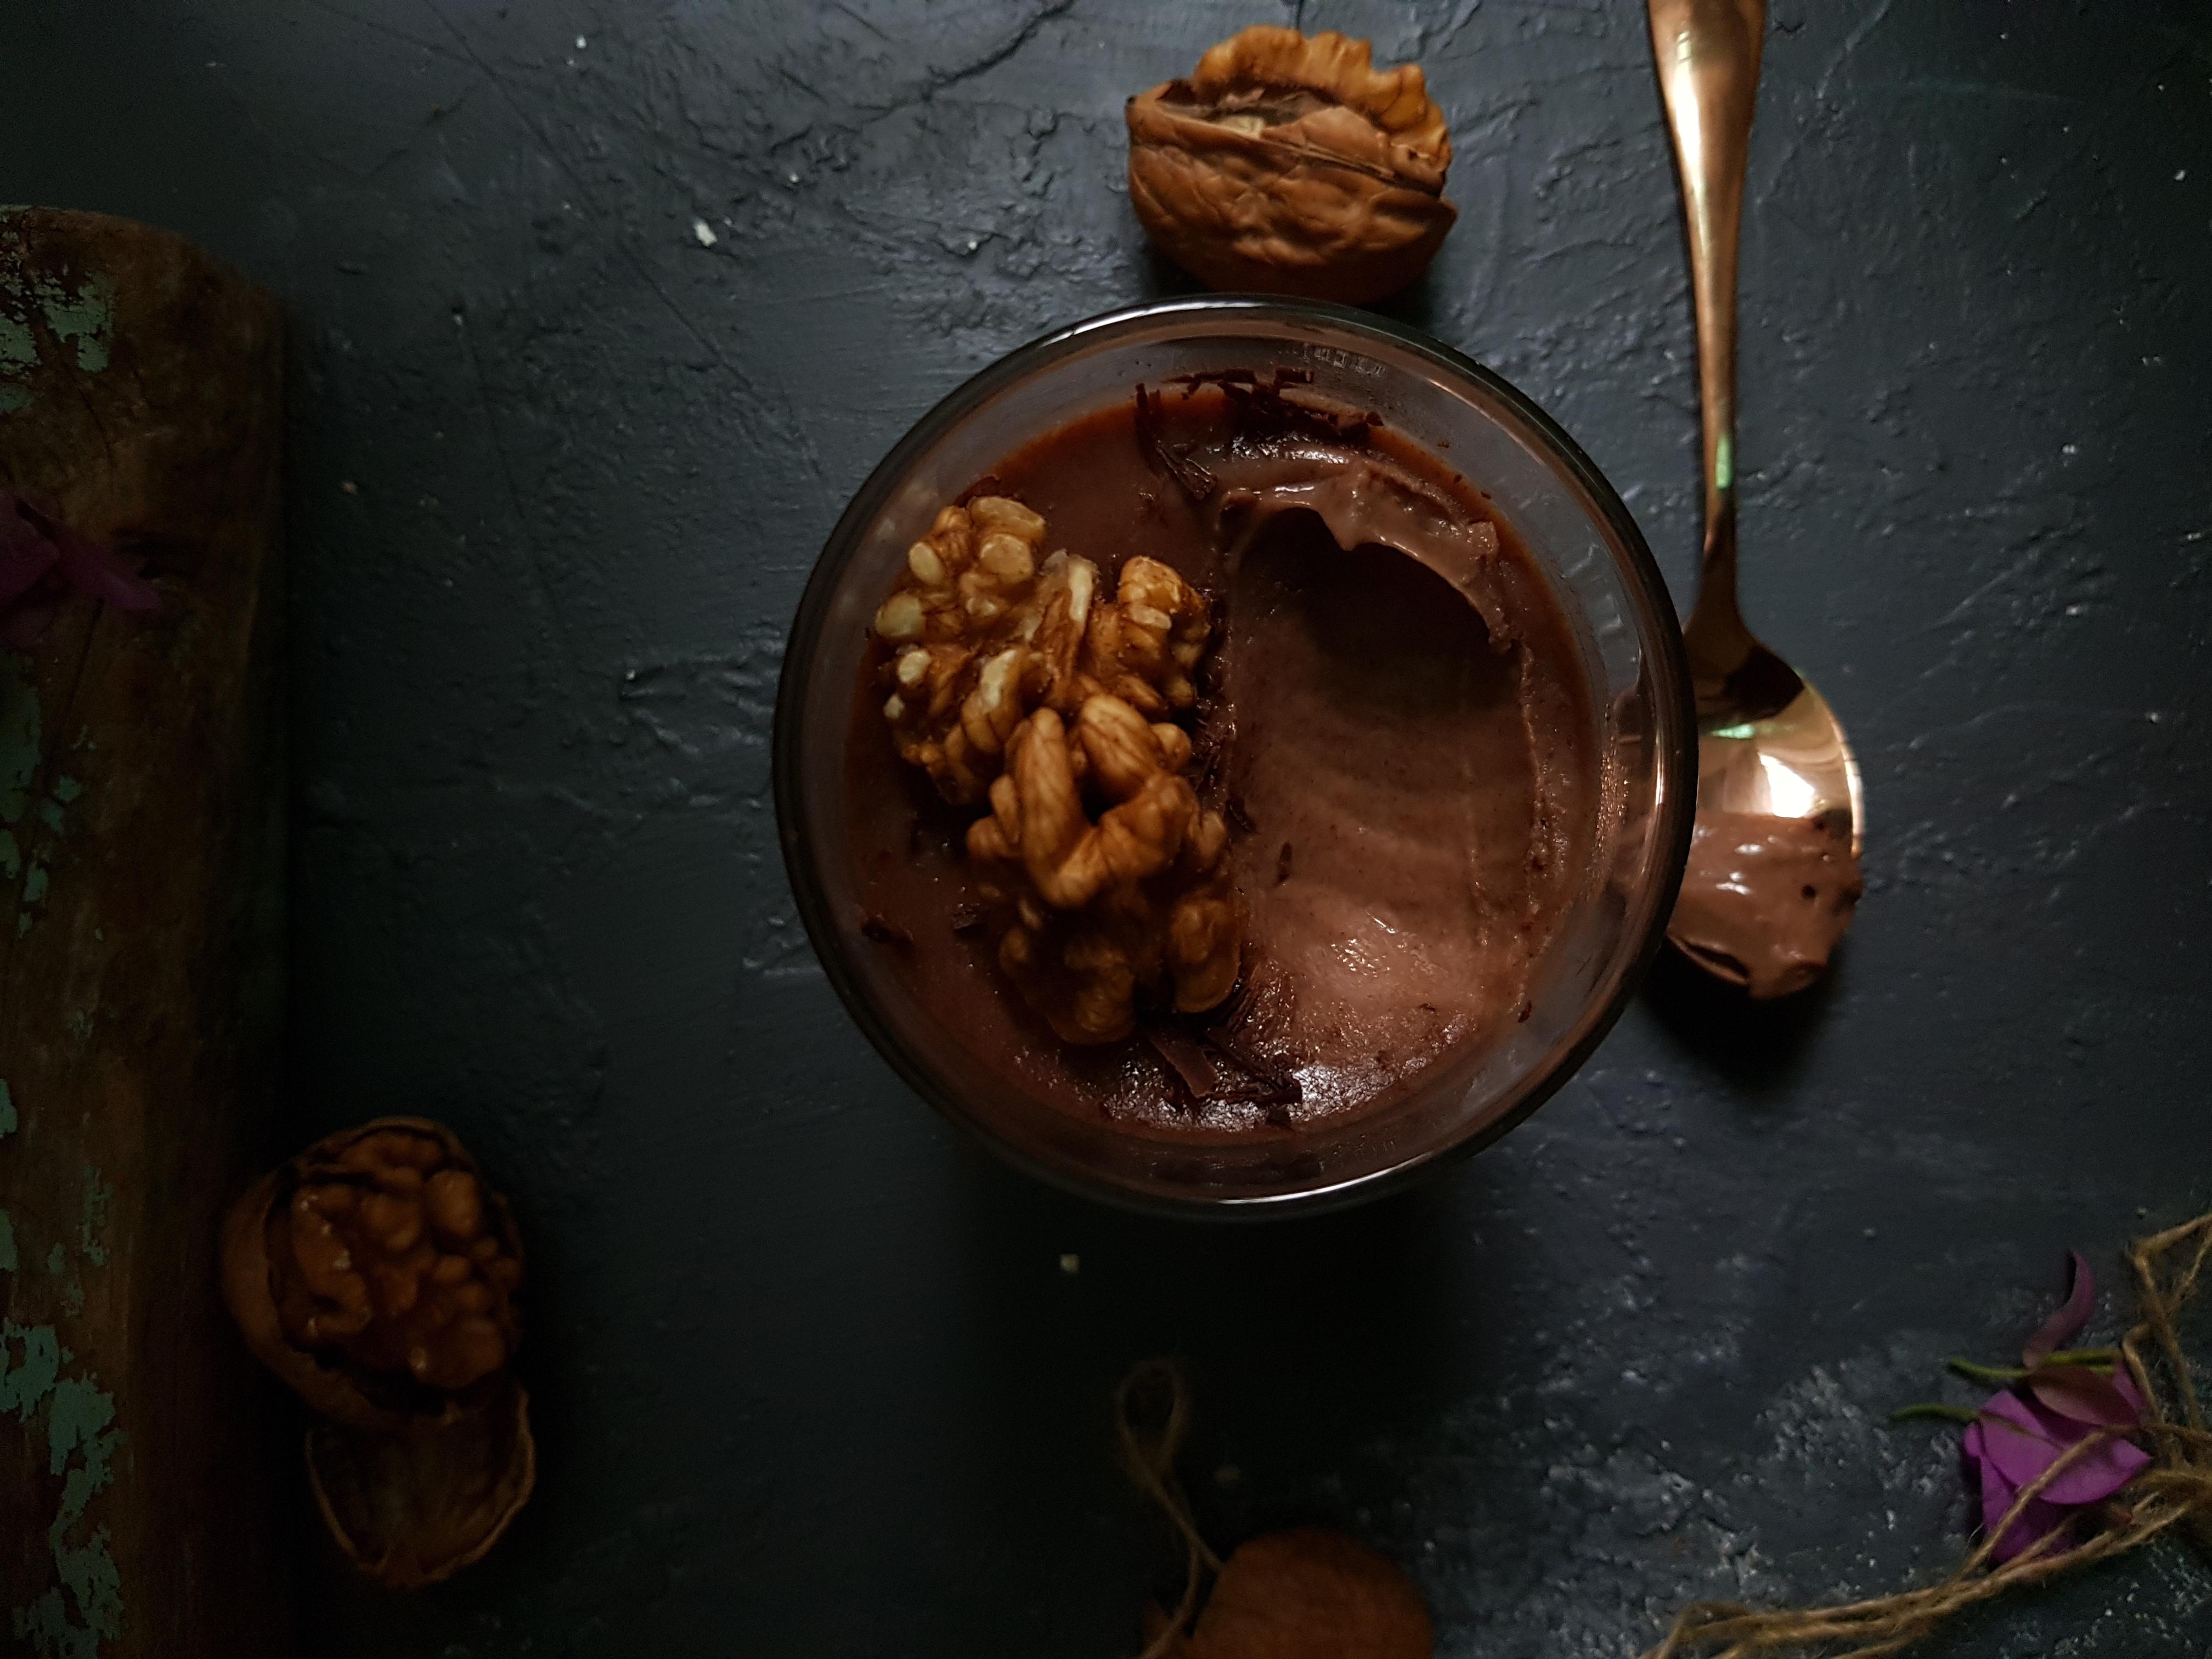 Chocolate Panna cotta - Italian Dessert